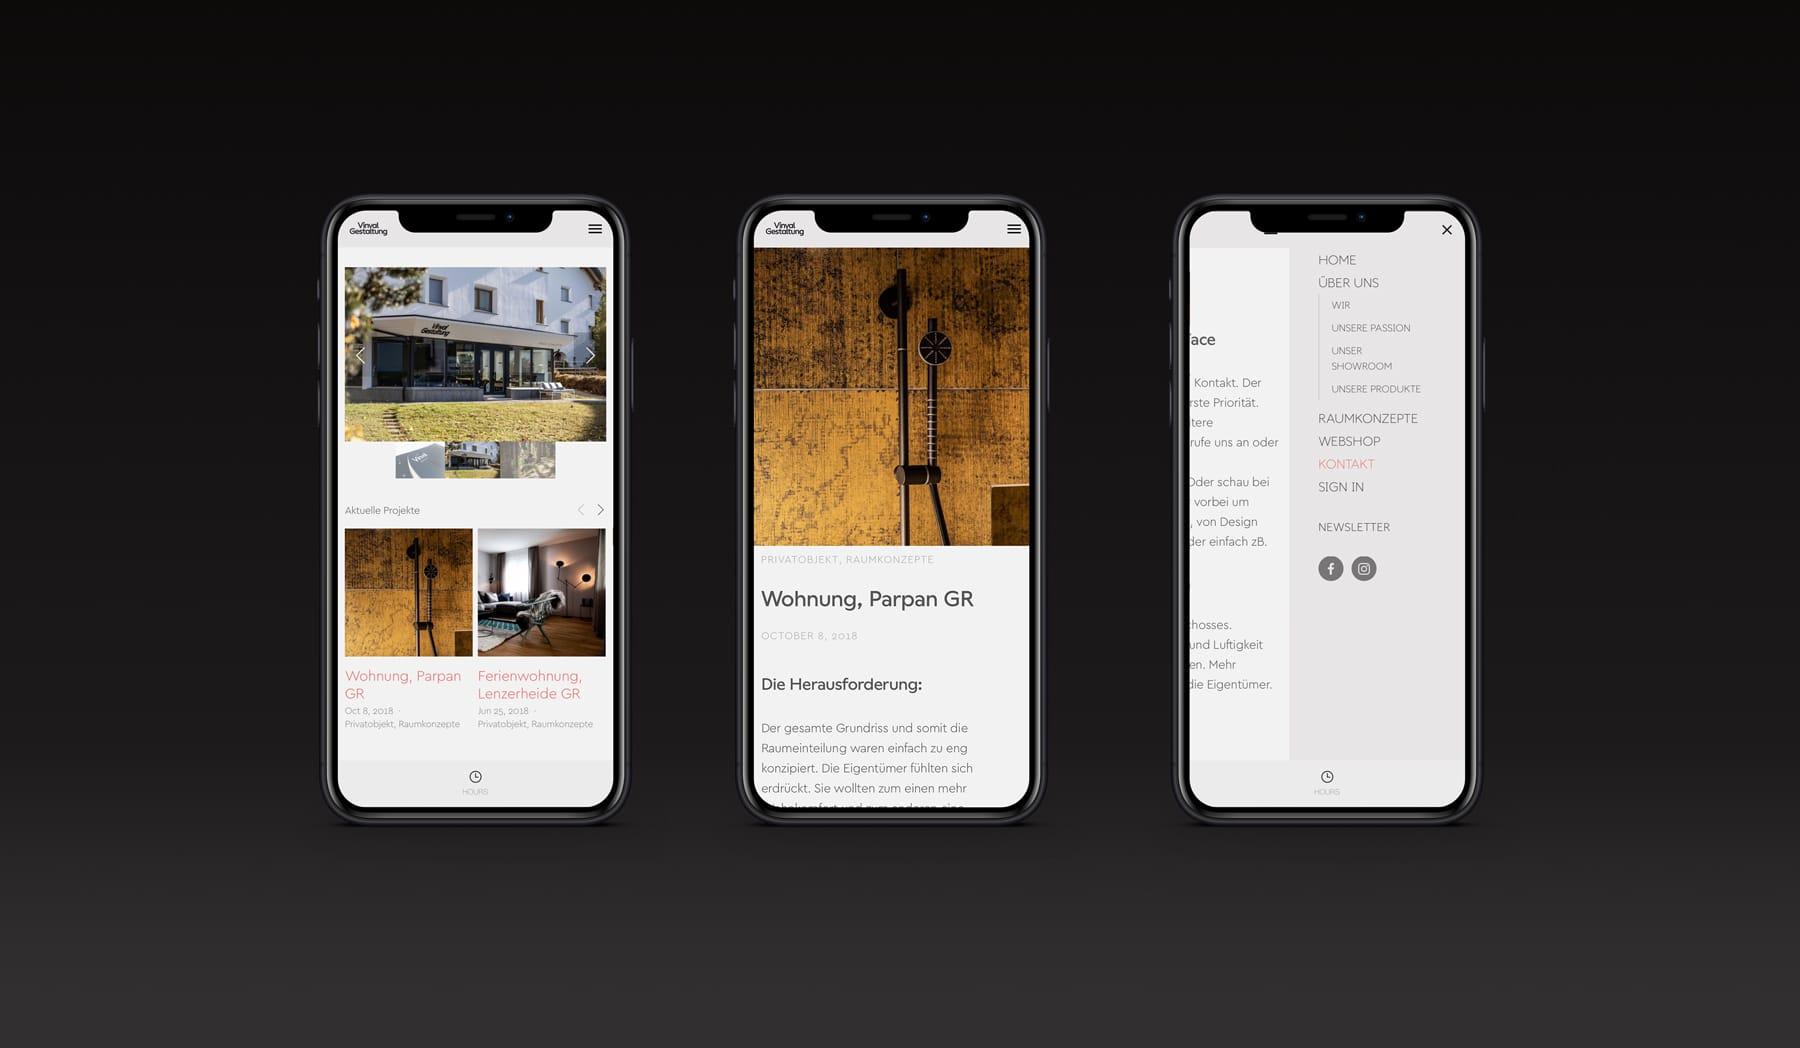 iPhoneX_website_x3.jpg